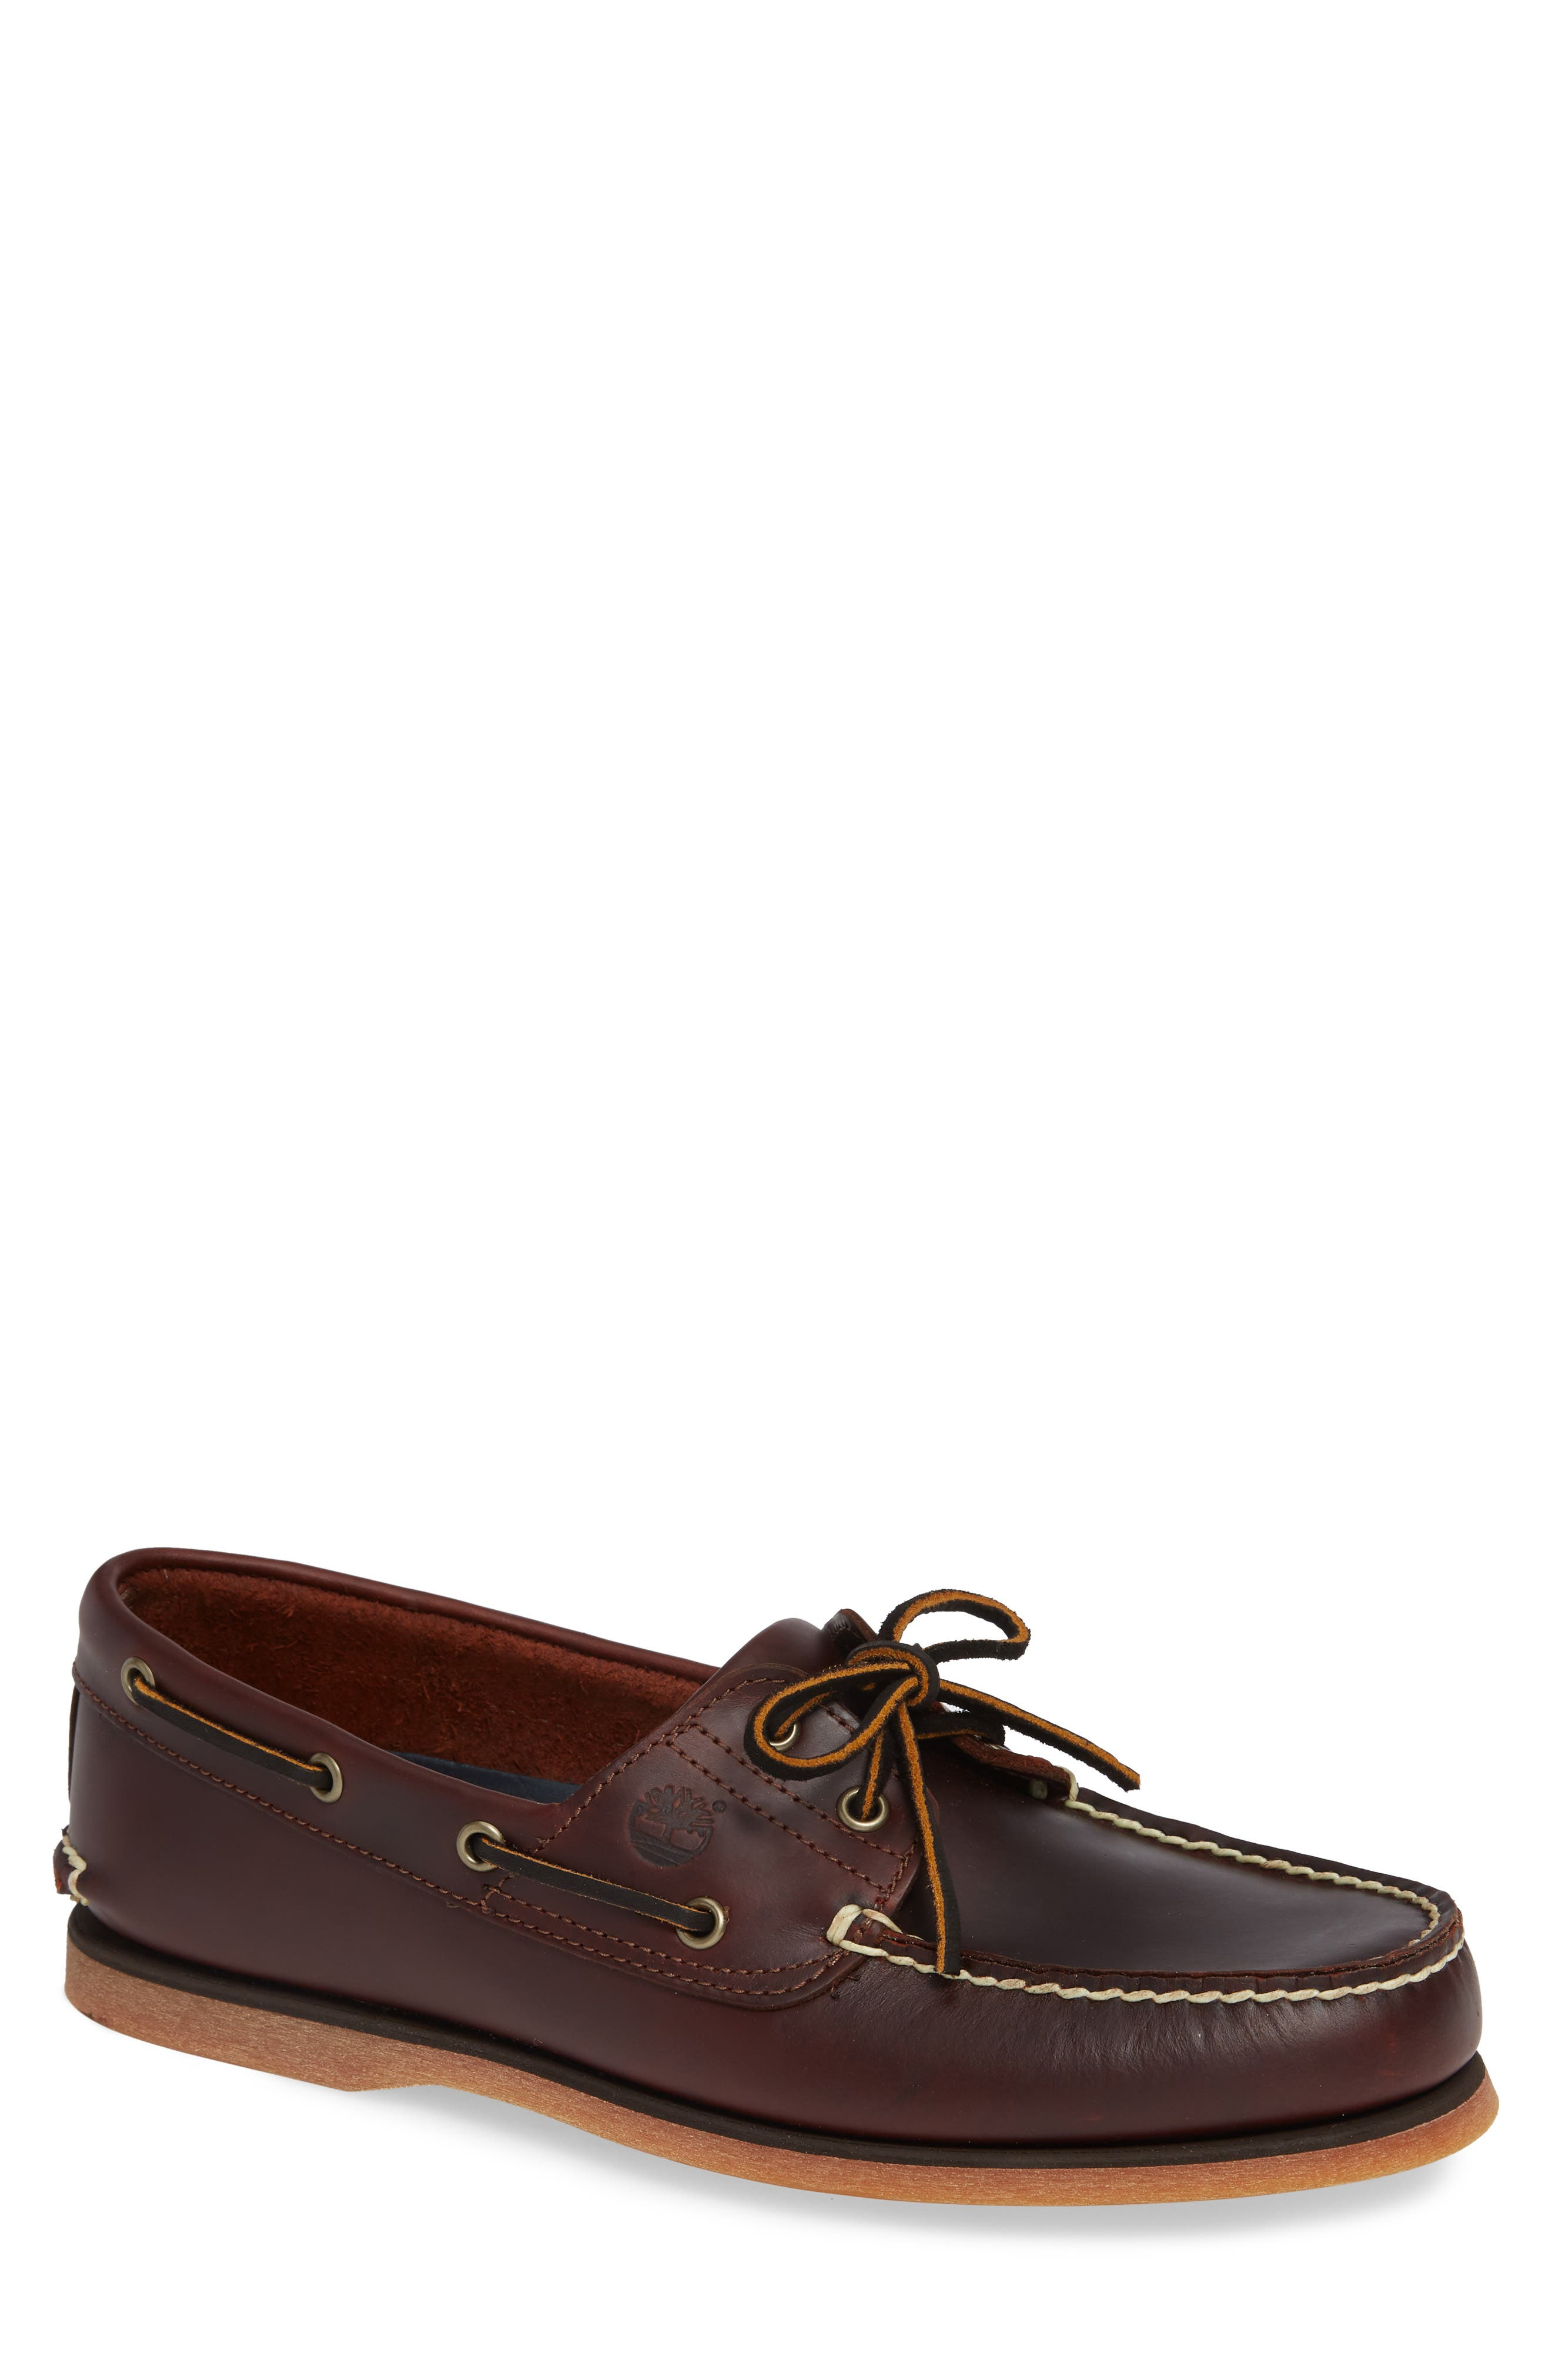 UPC 000906077458 Men's Timberland Classic 2 Eye Boat Shoe